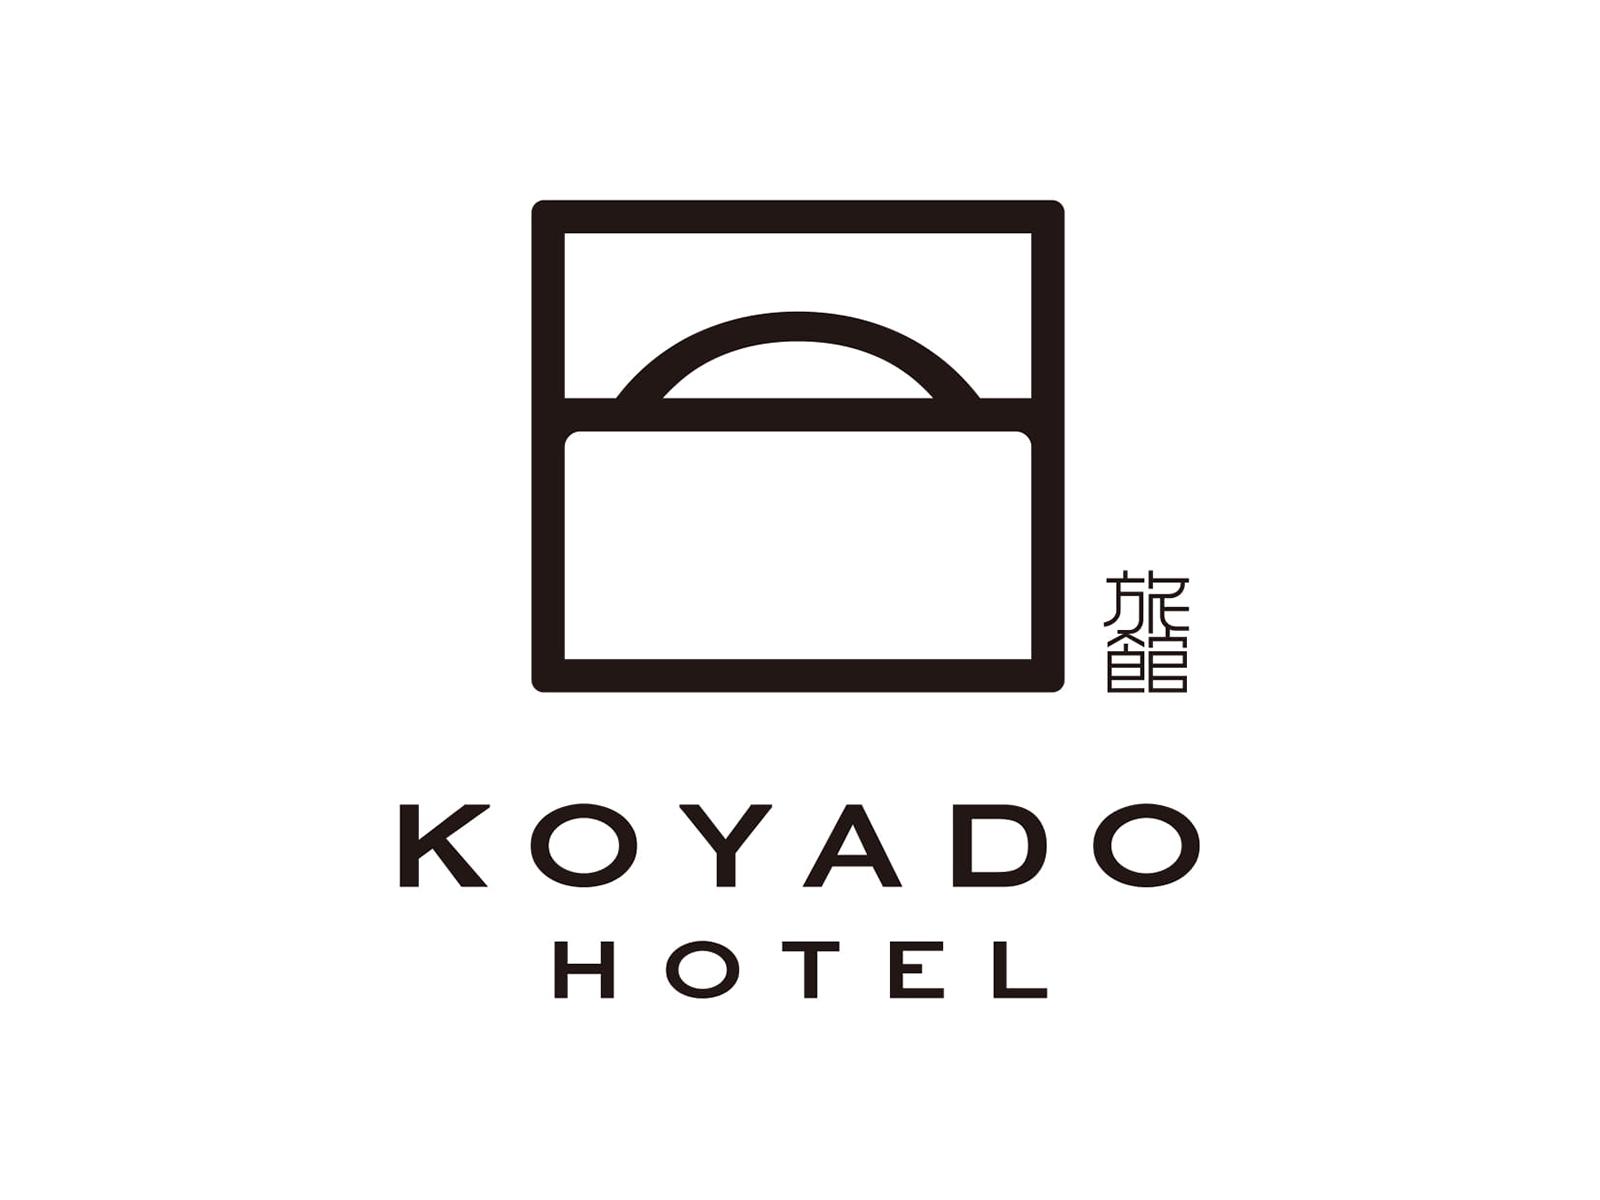 KOYADO HOTEL